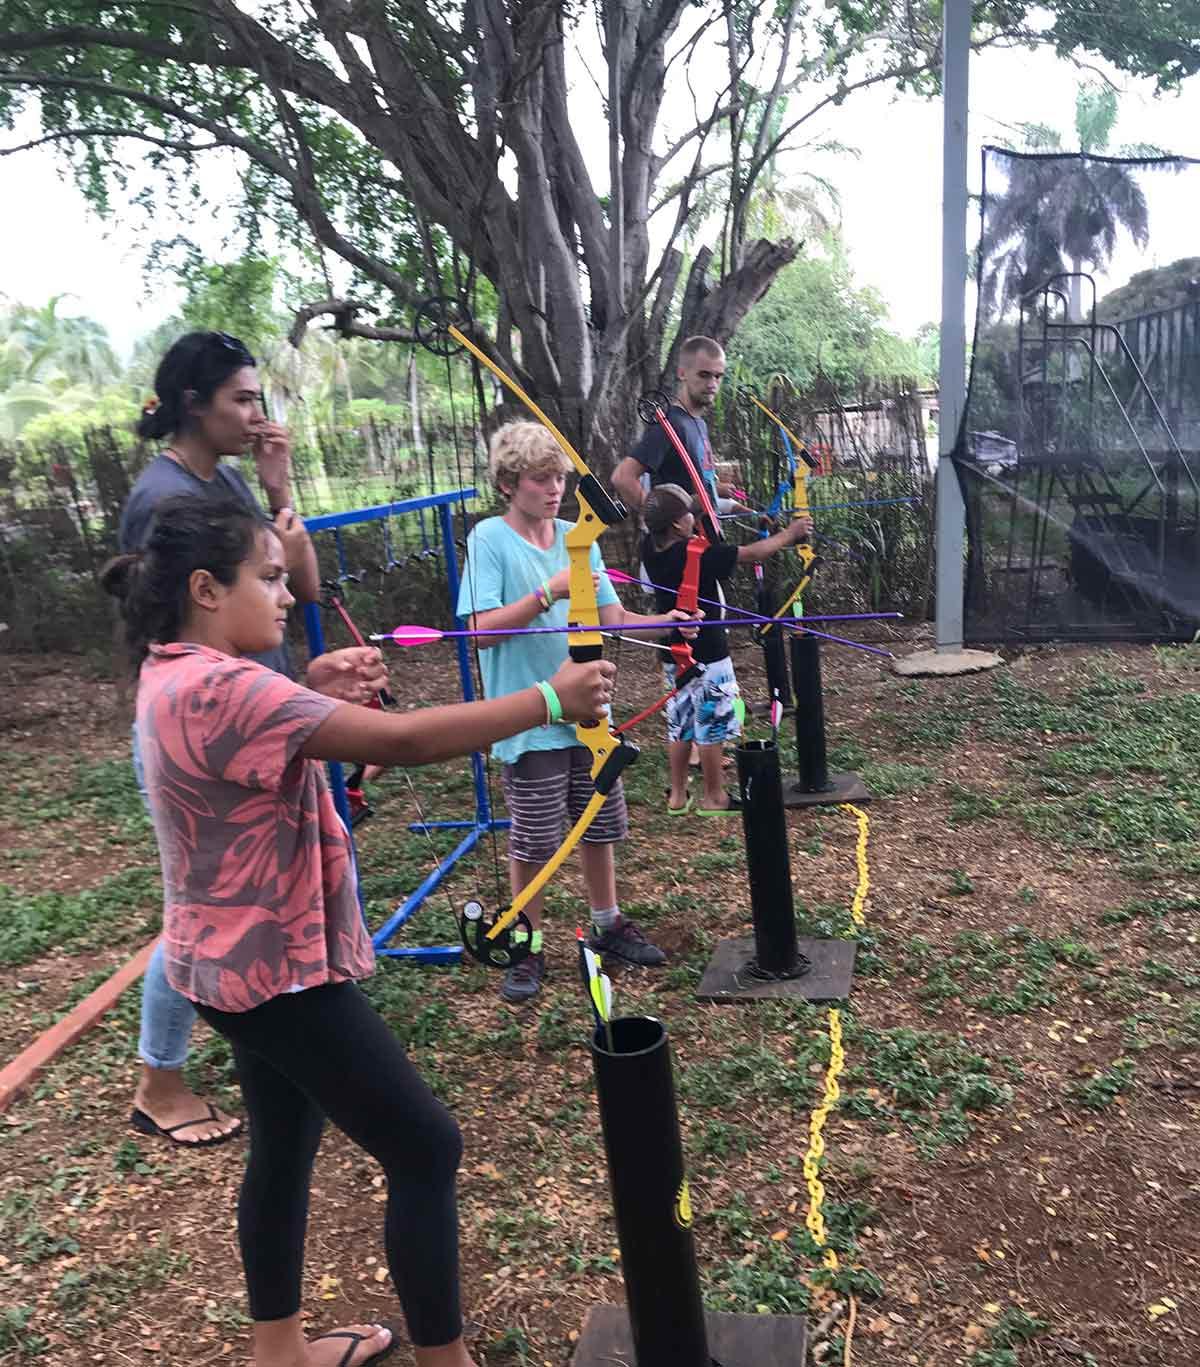 camp-homelani-kids-archery